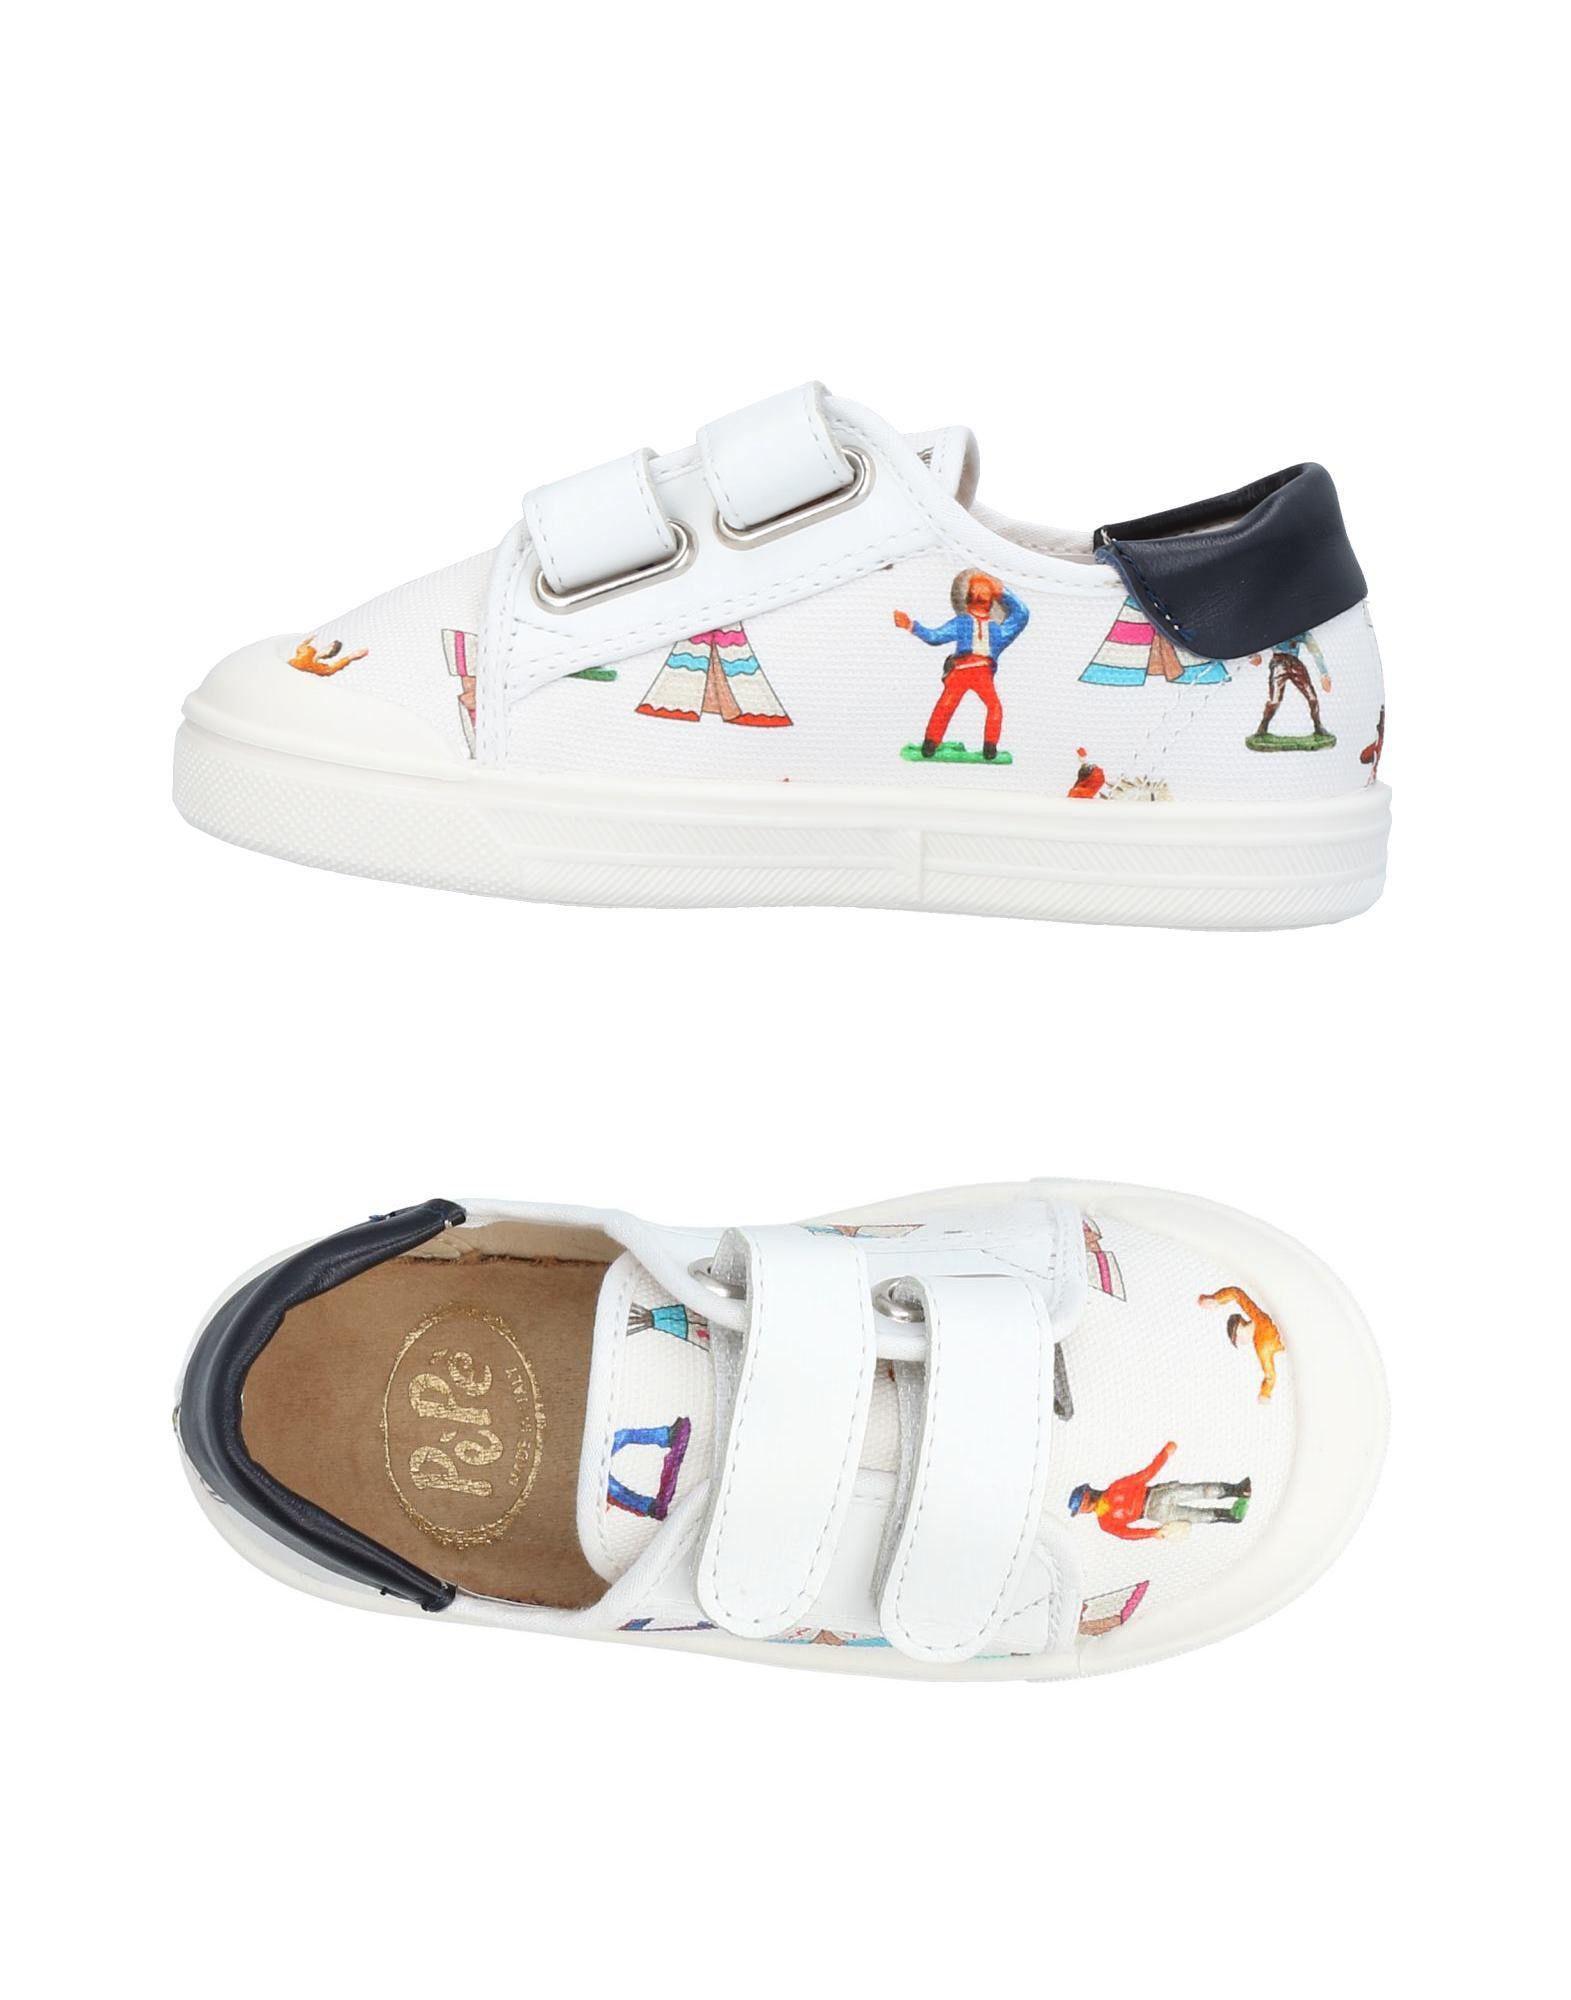 Pepe Jeans Bas-tops Et Baskets YvMaX6YykI